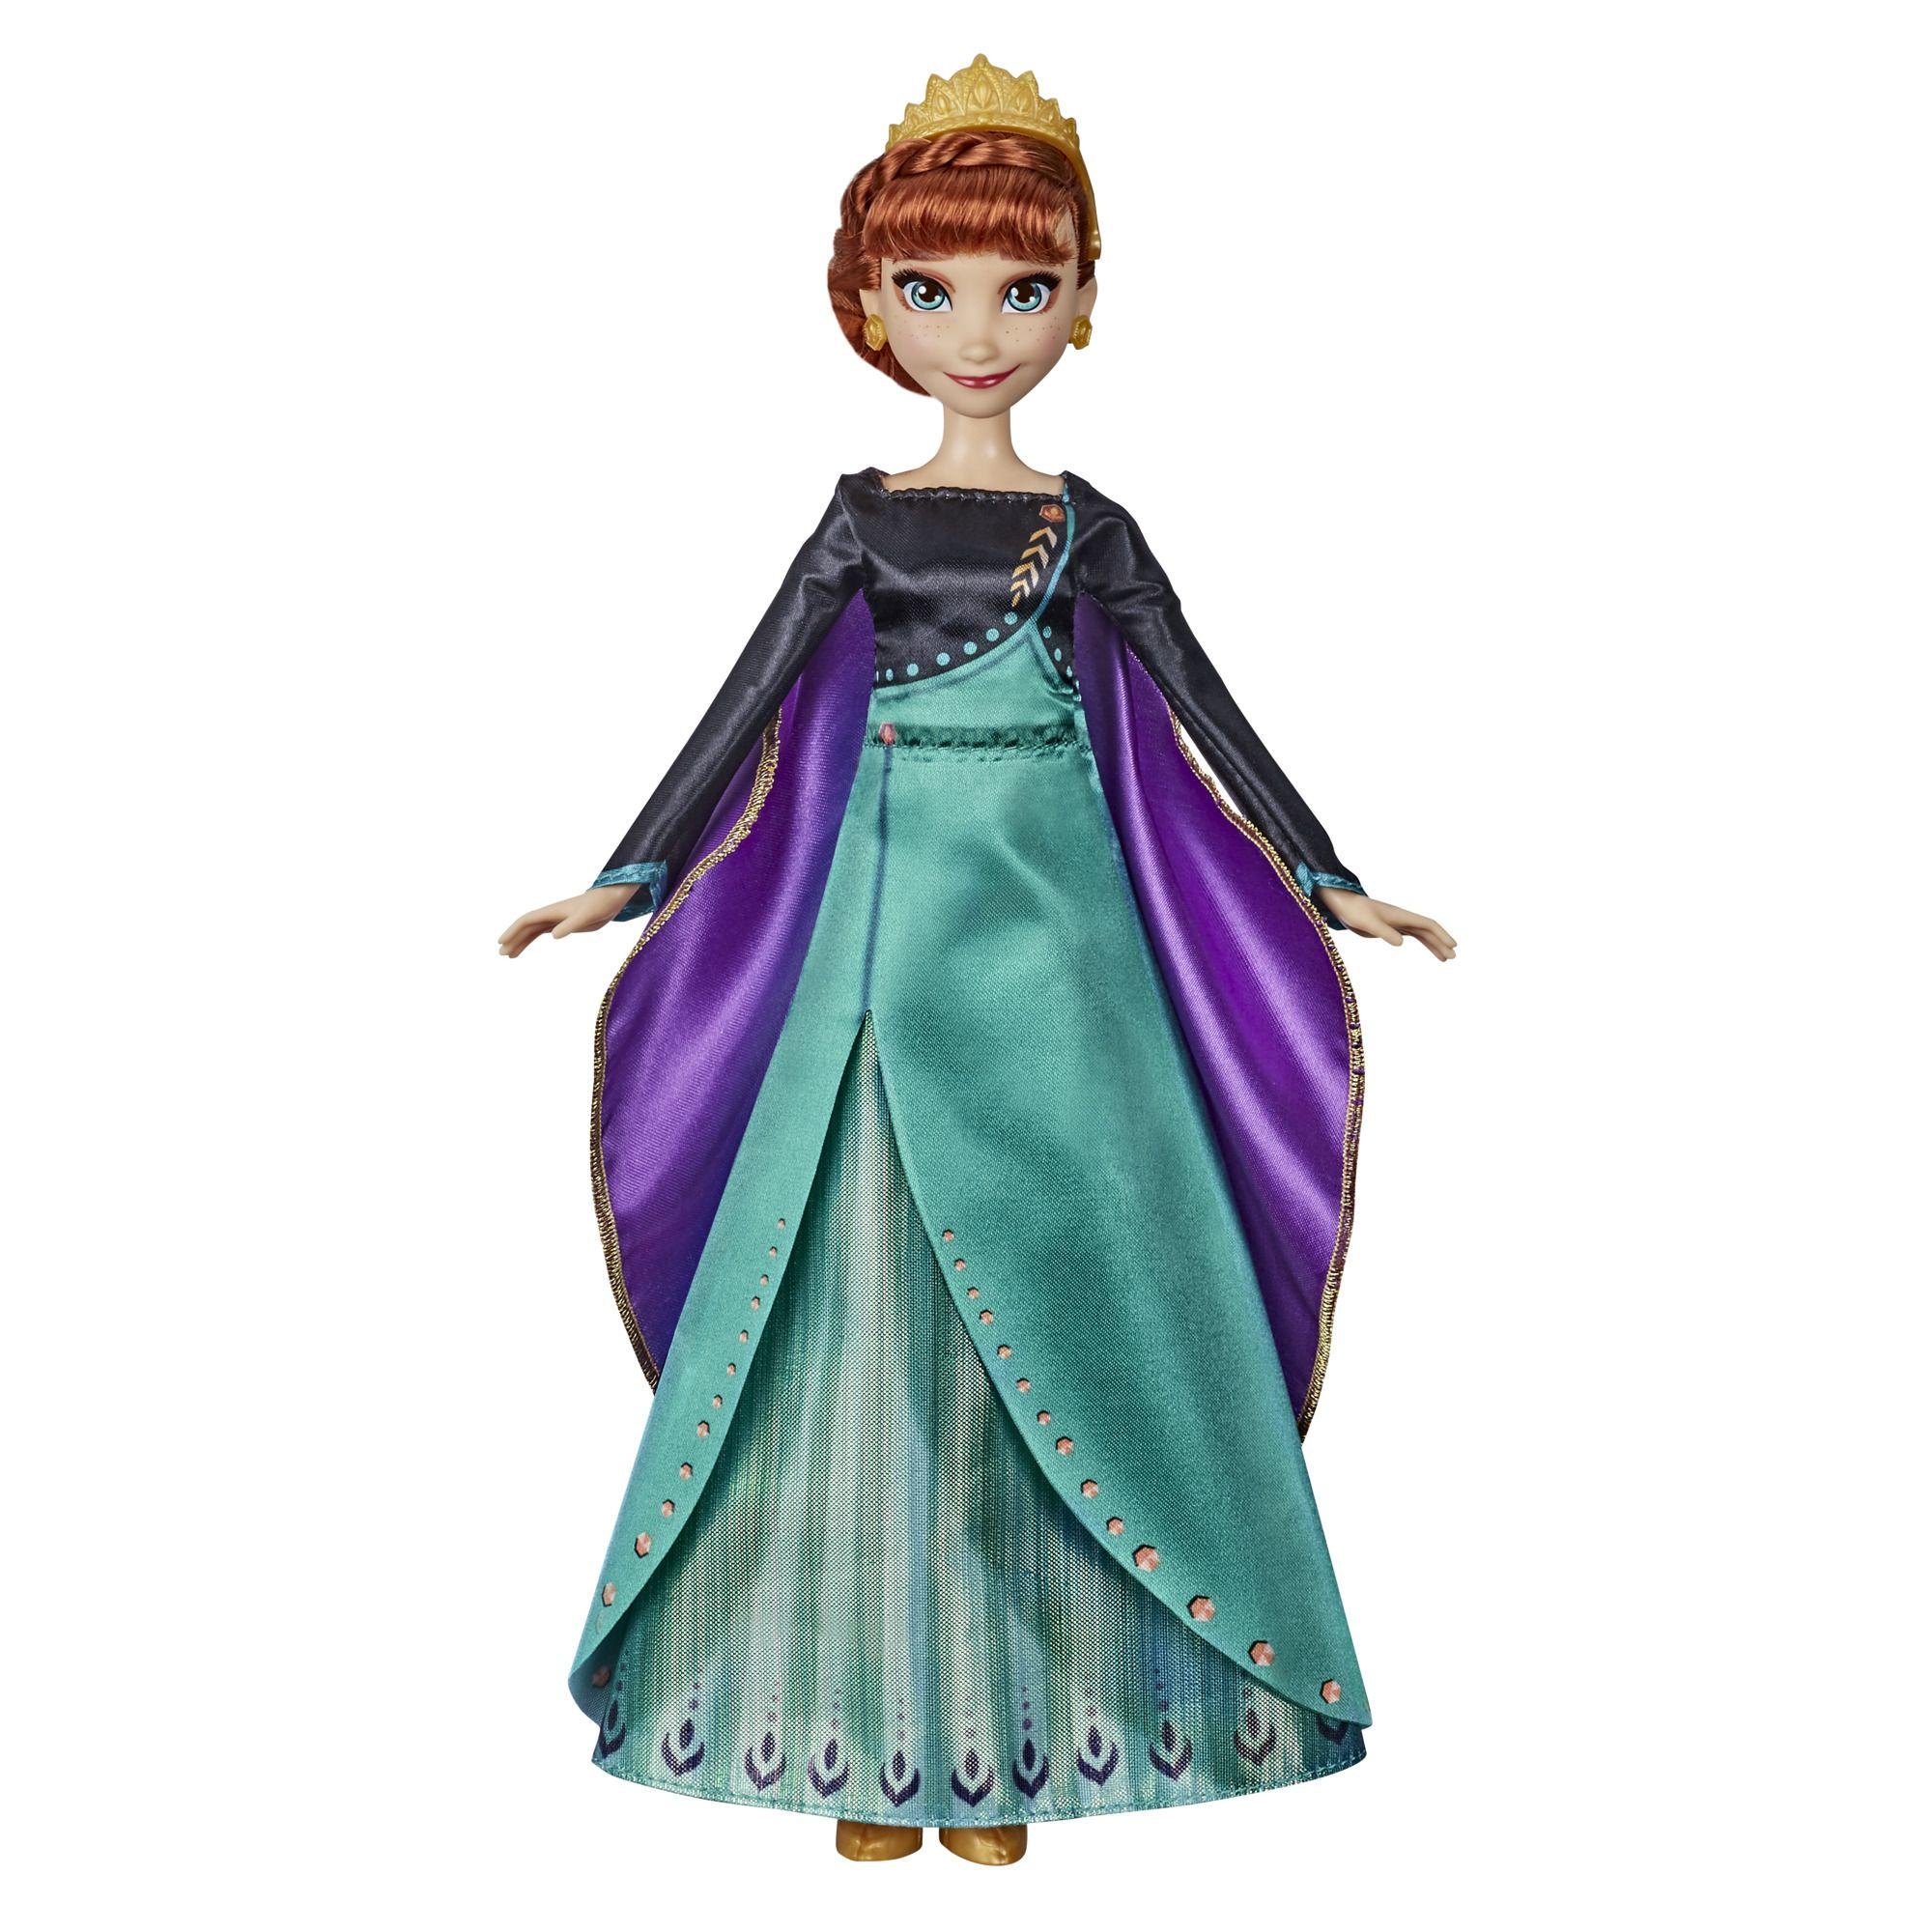 Frozen 2 Musical Adventure Anna Doll, Sings